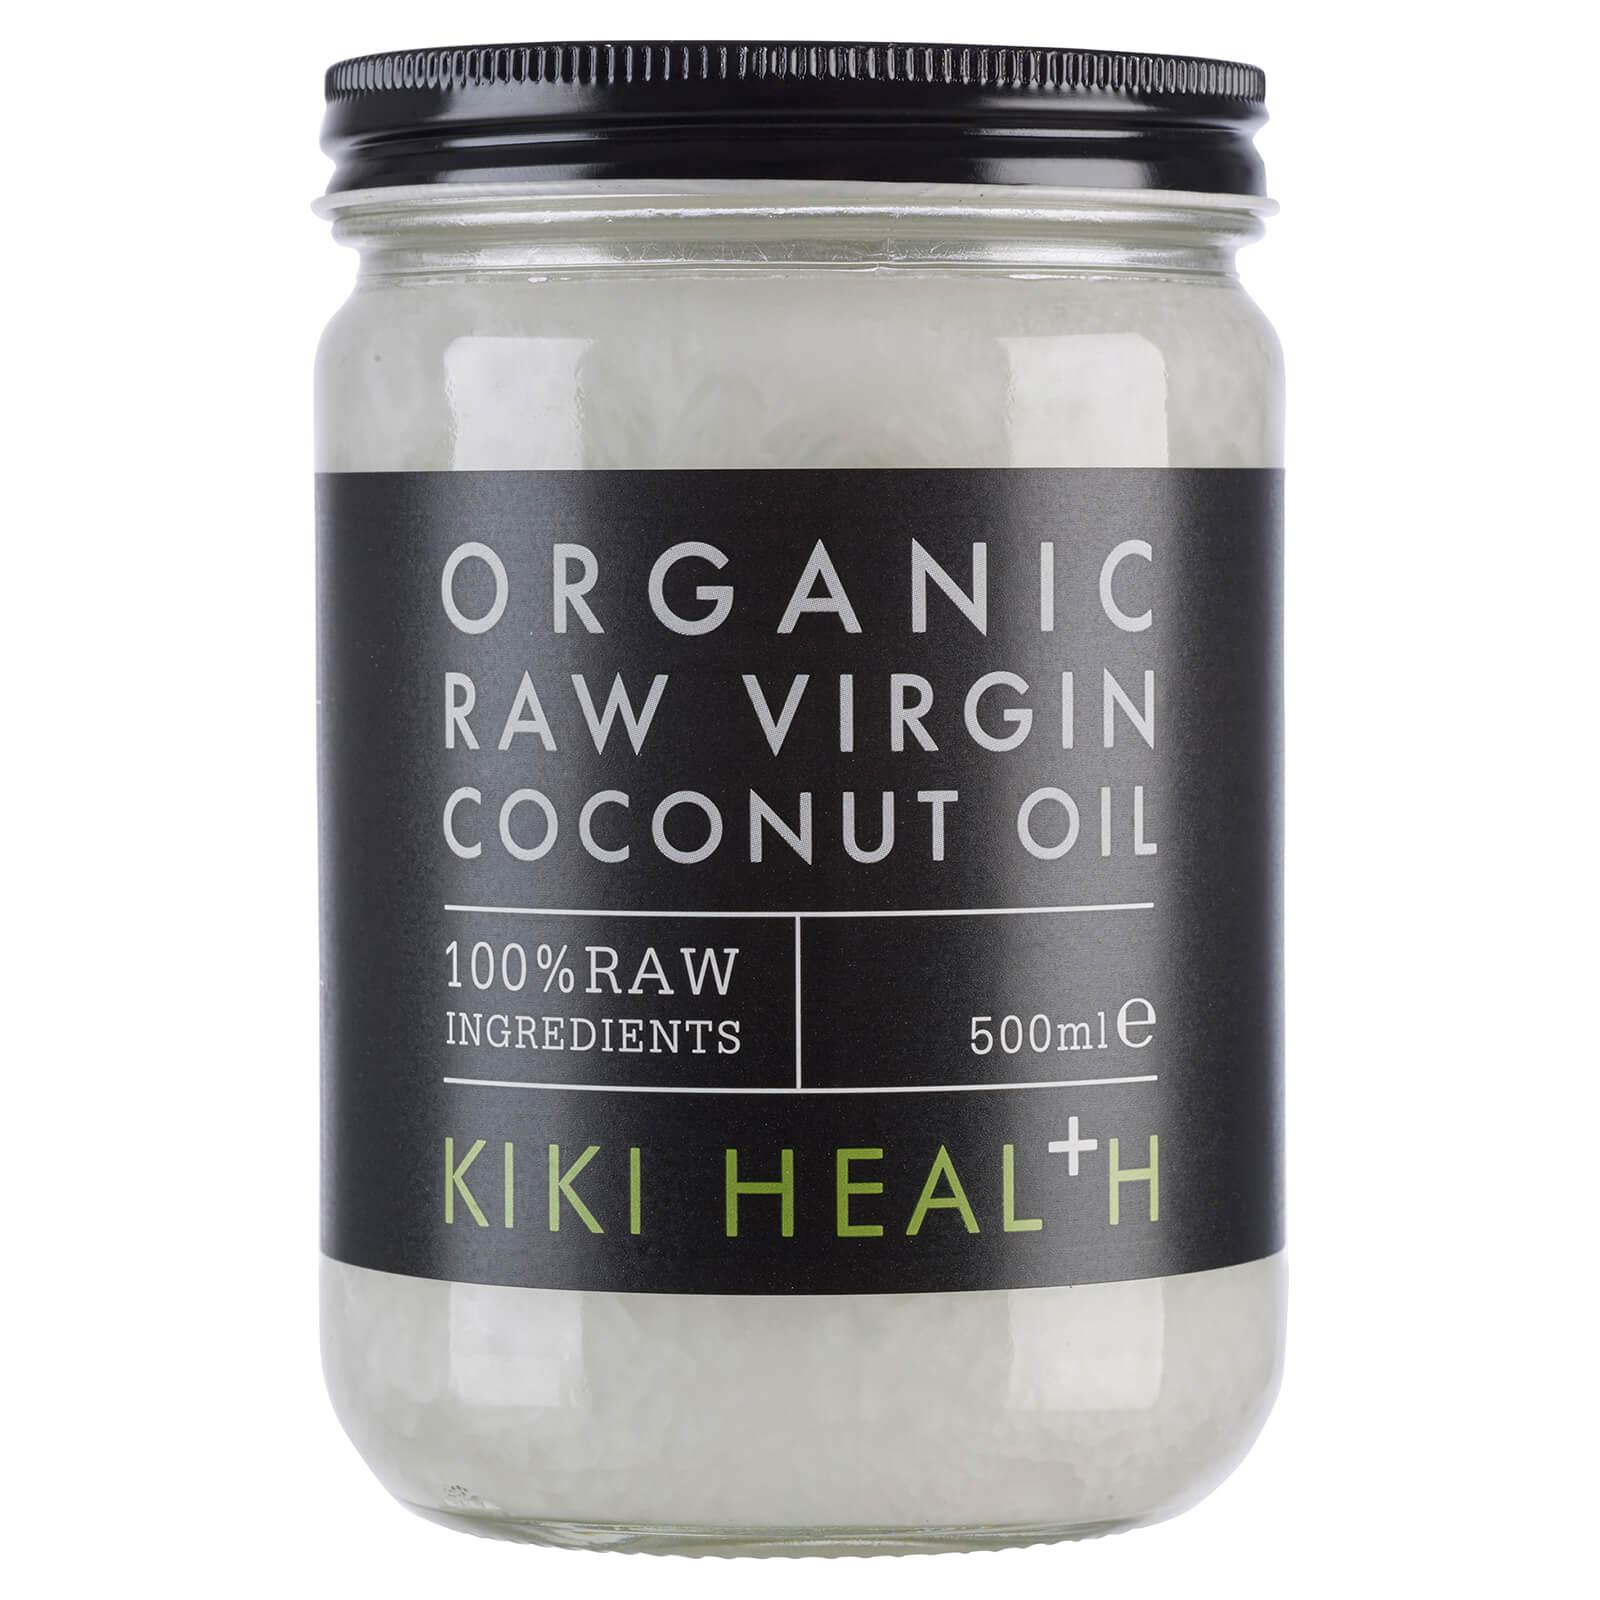 KIKI Health Huile de Noix de Coco Vierge Biologique Brute KIKI Health 500 ml